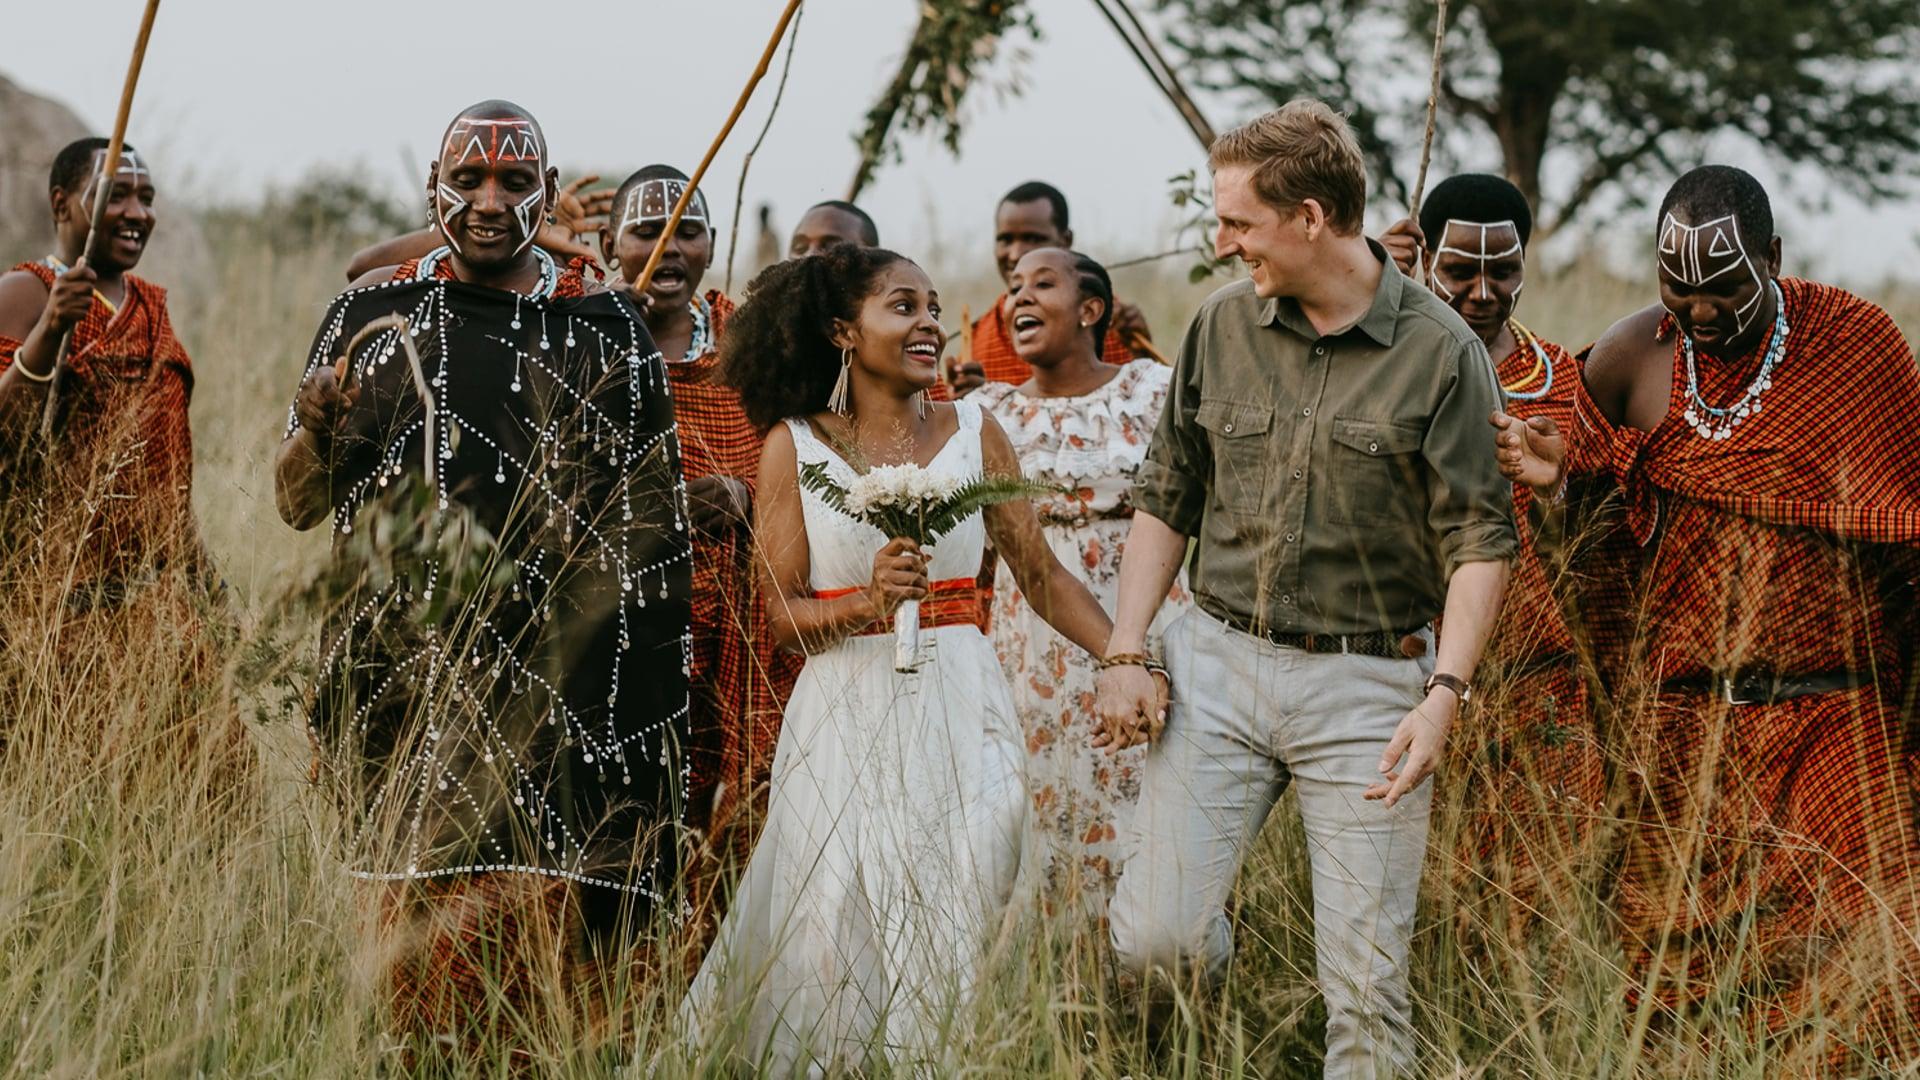 Wedding in Africa - Four Seasons Serengeti - Tanzania